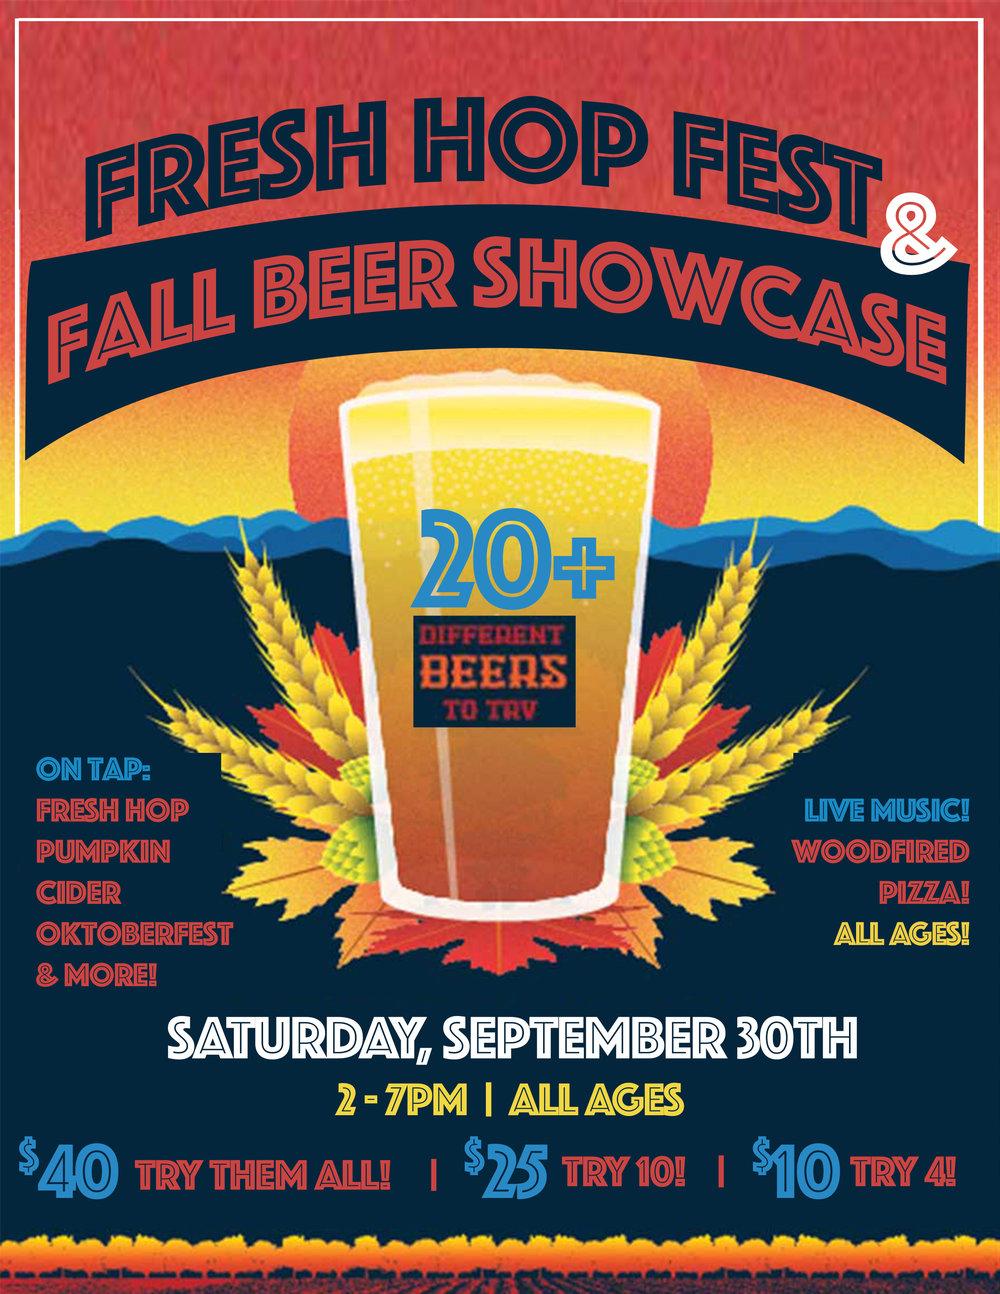 Fall Beer Showcase_Flyer.jpg